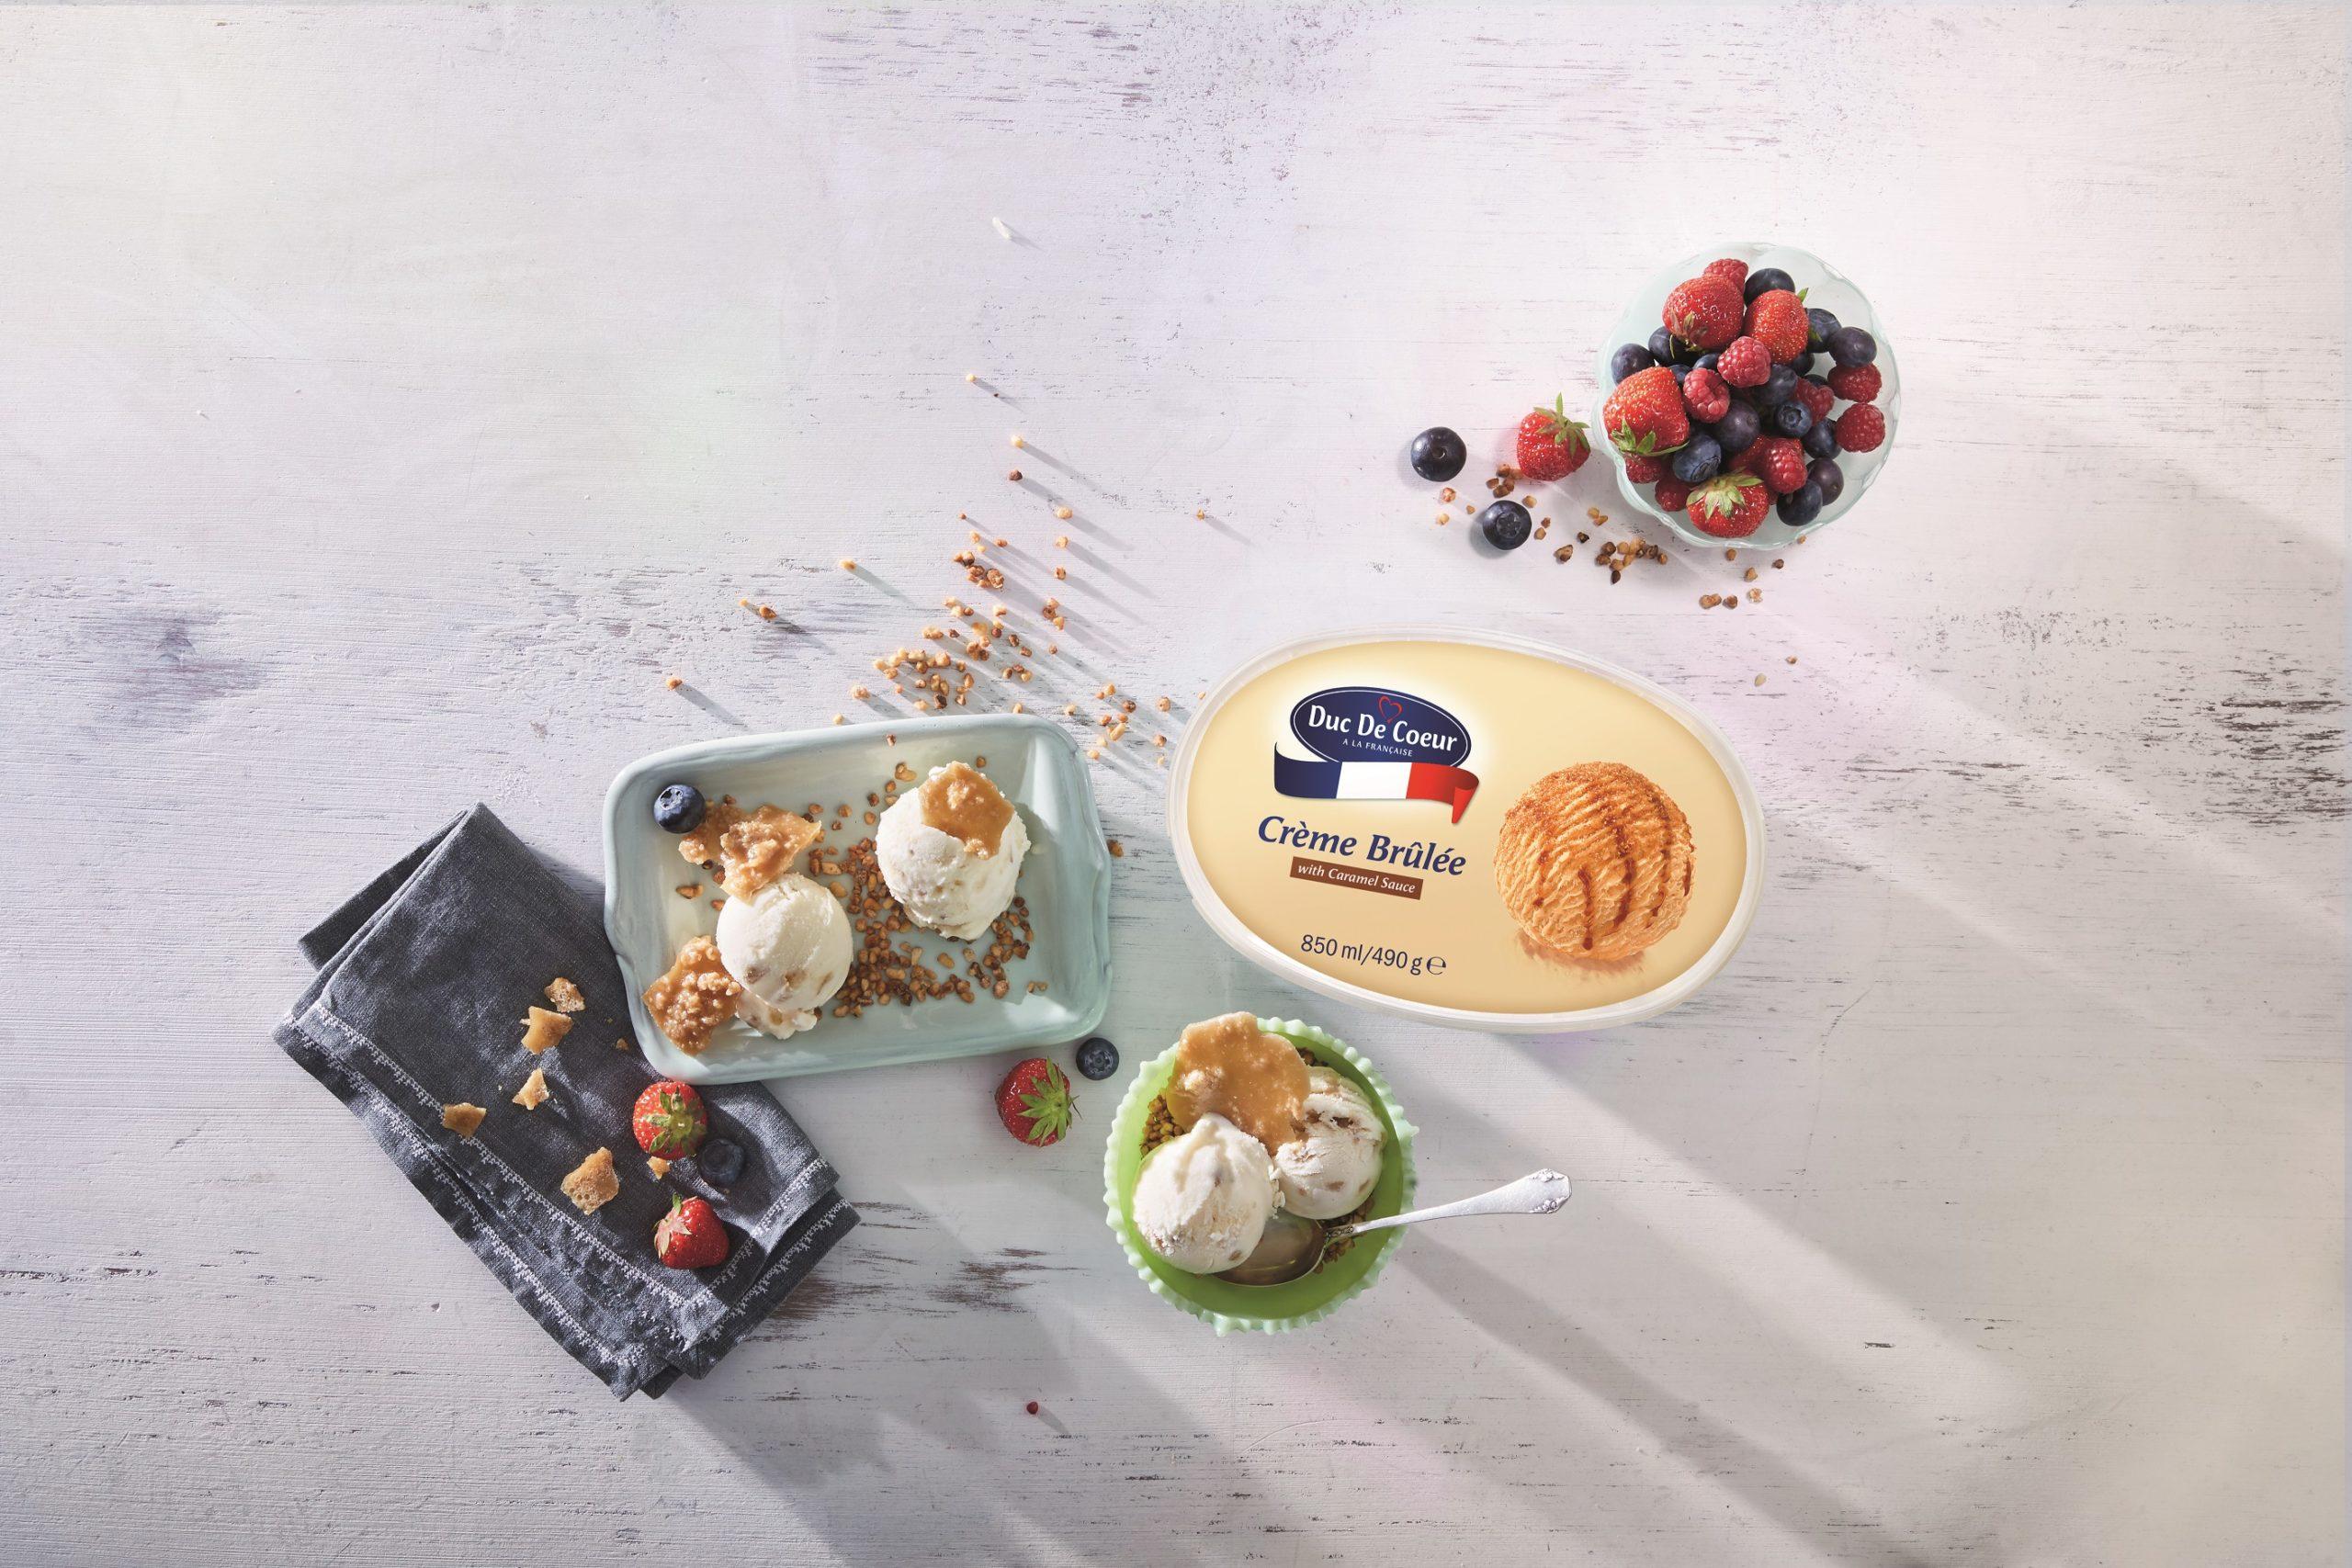 Lidl Crème Brûlée ice cream